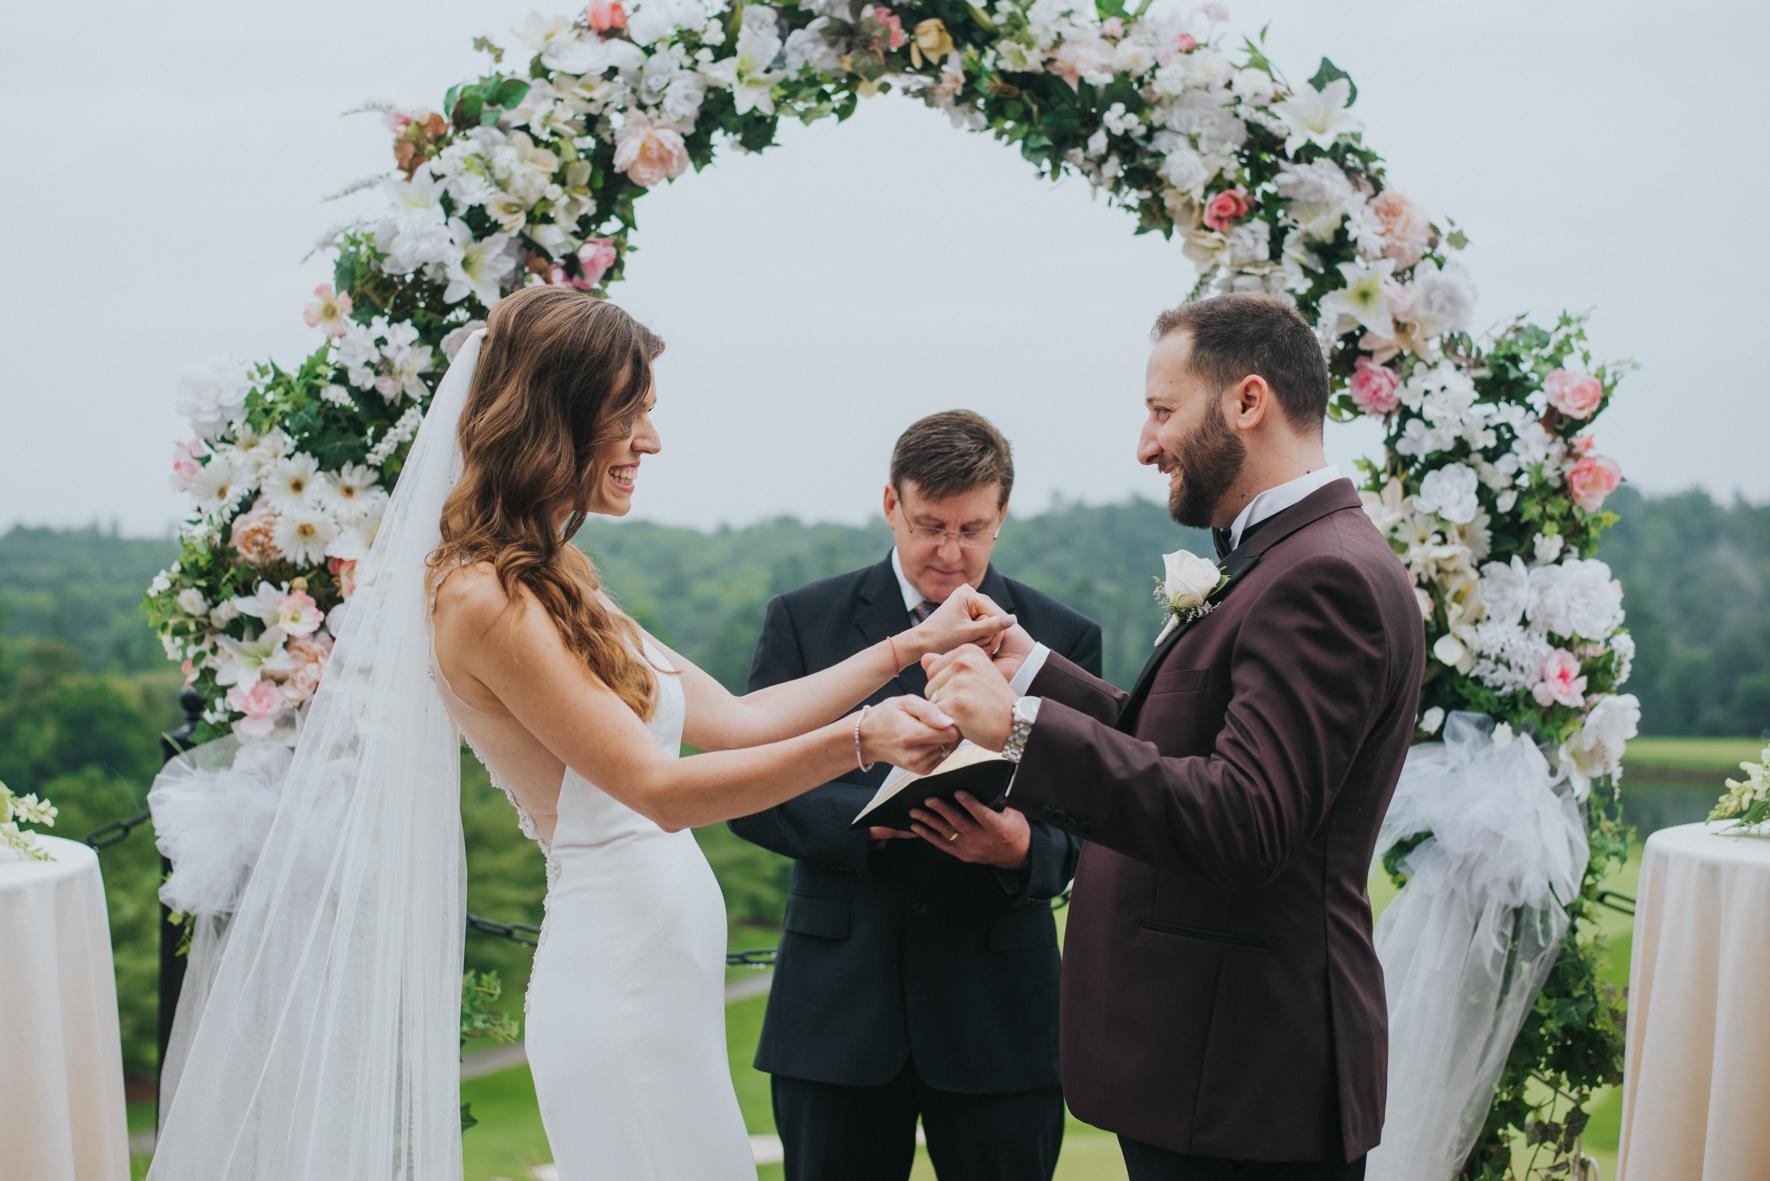 sandy-jana-copper-creek-golf-club-slovak-wedding-toronto-scandaleuse-photography-weddings-18.jpg